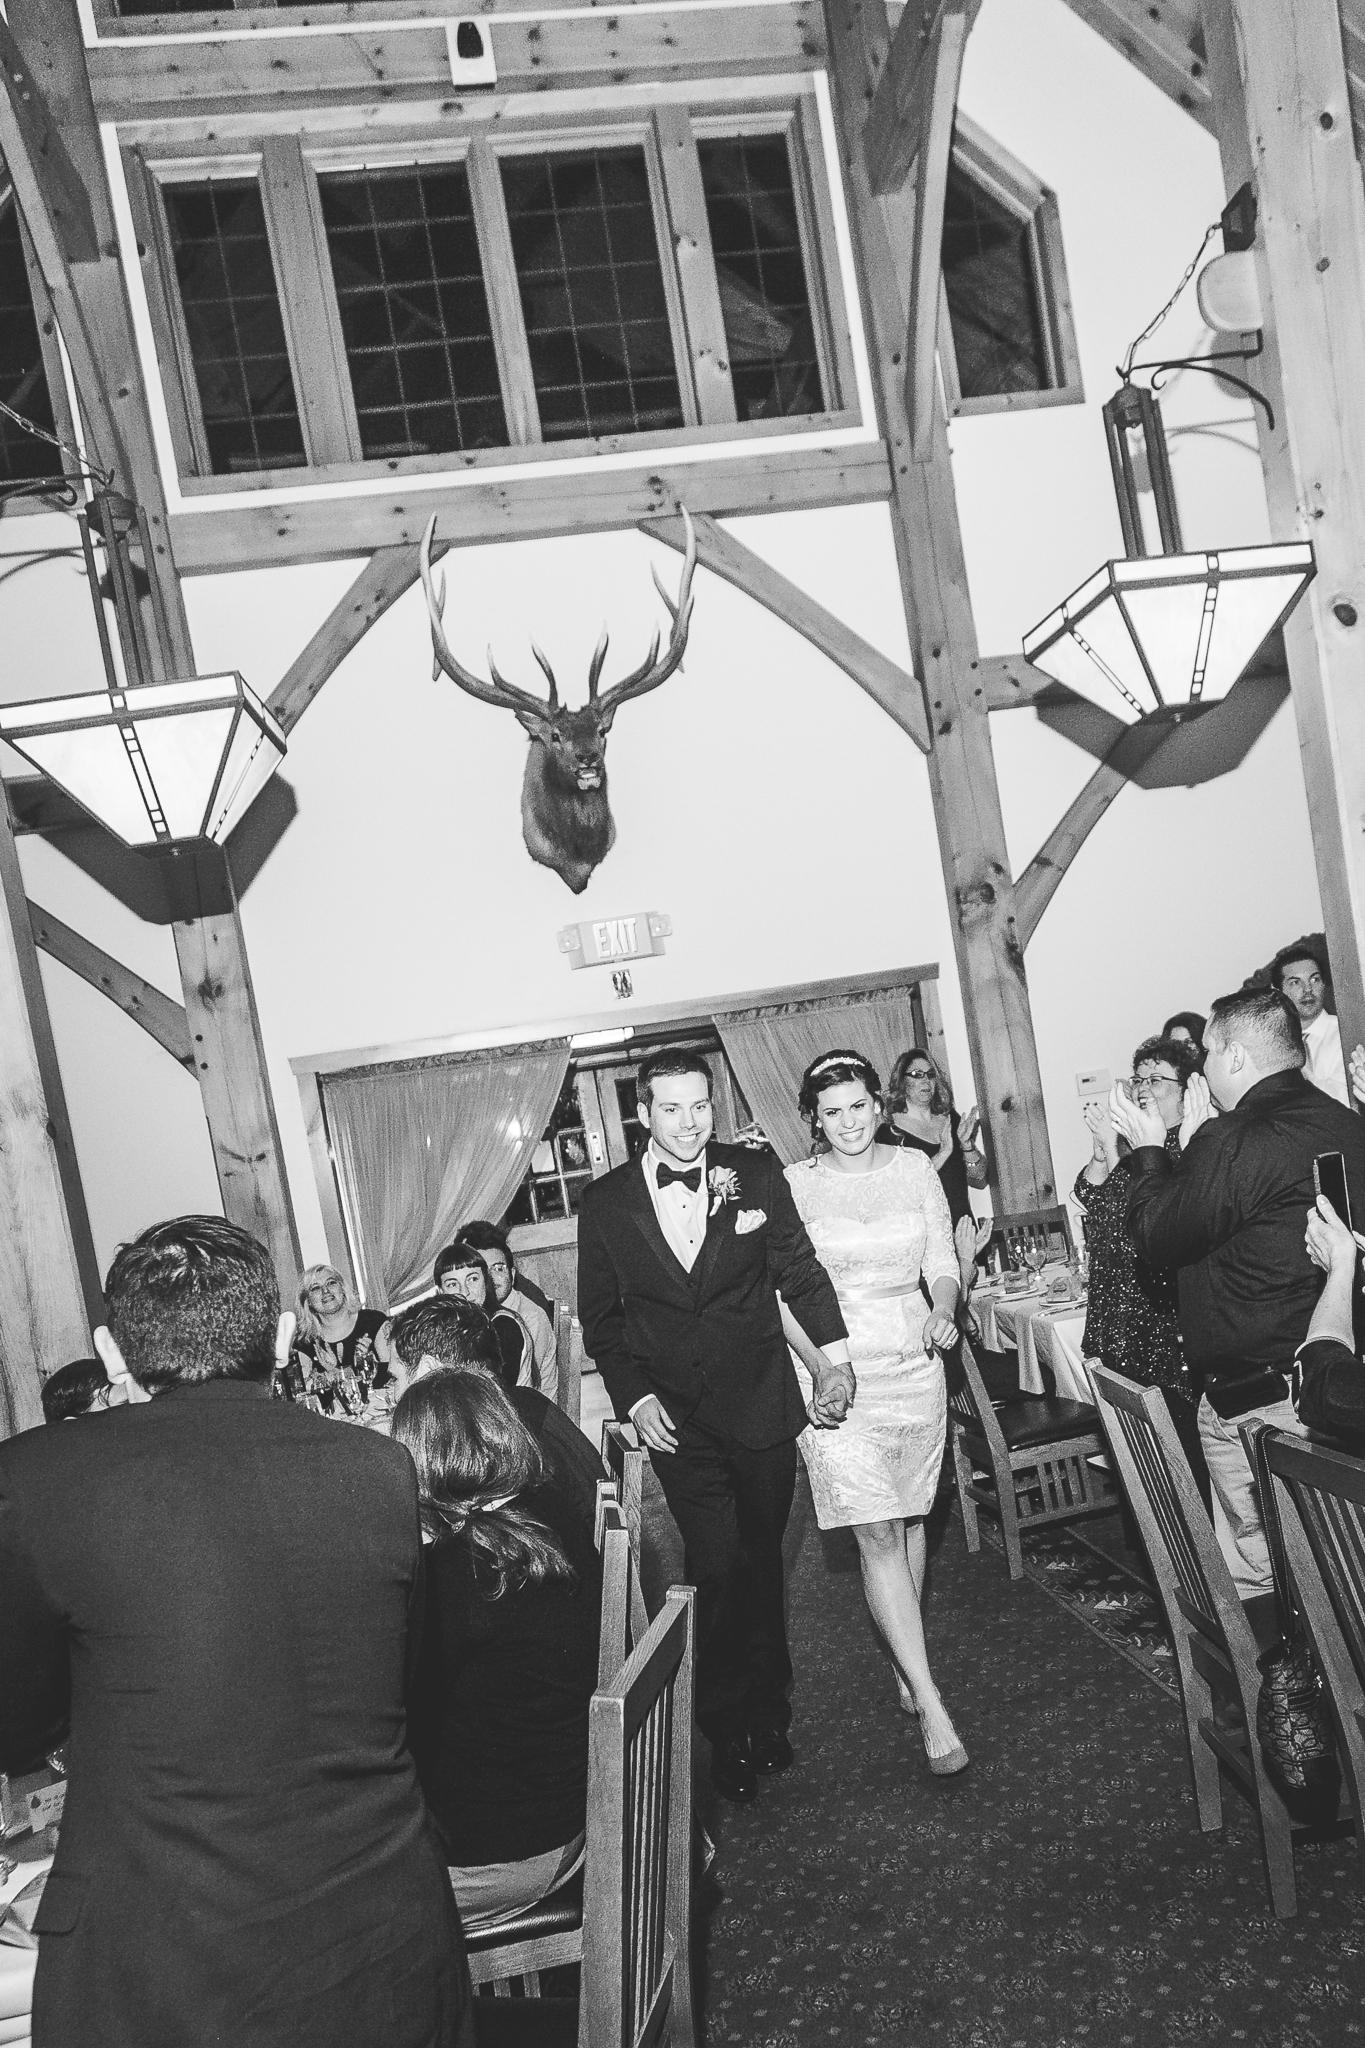 camuglia-whomstudio-chelsea_and_andy-nycphotographer-wedding-brooklyn-buffalo-timberlodge-095-5546.jpg